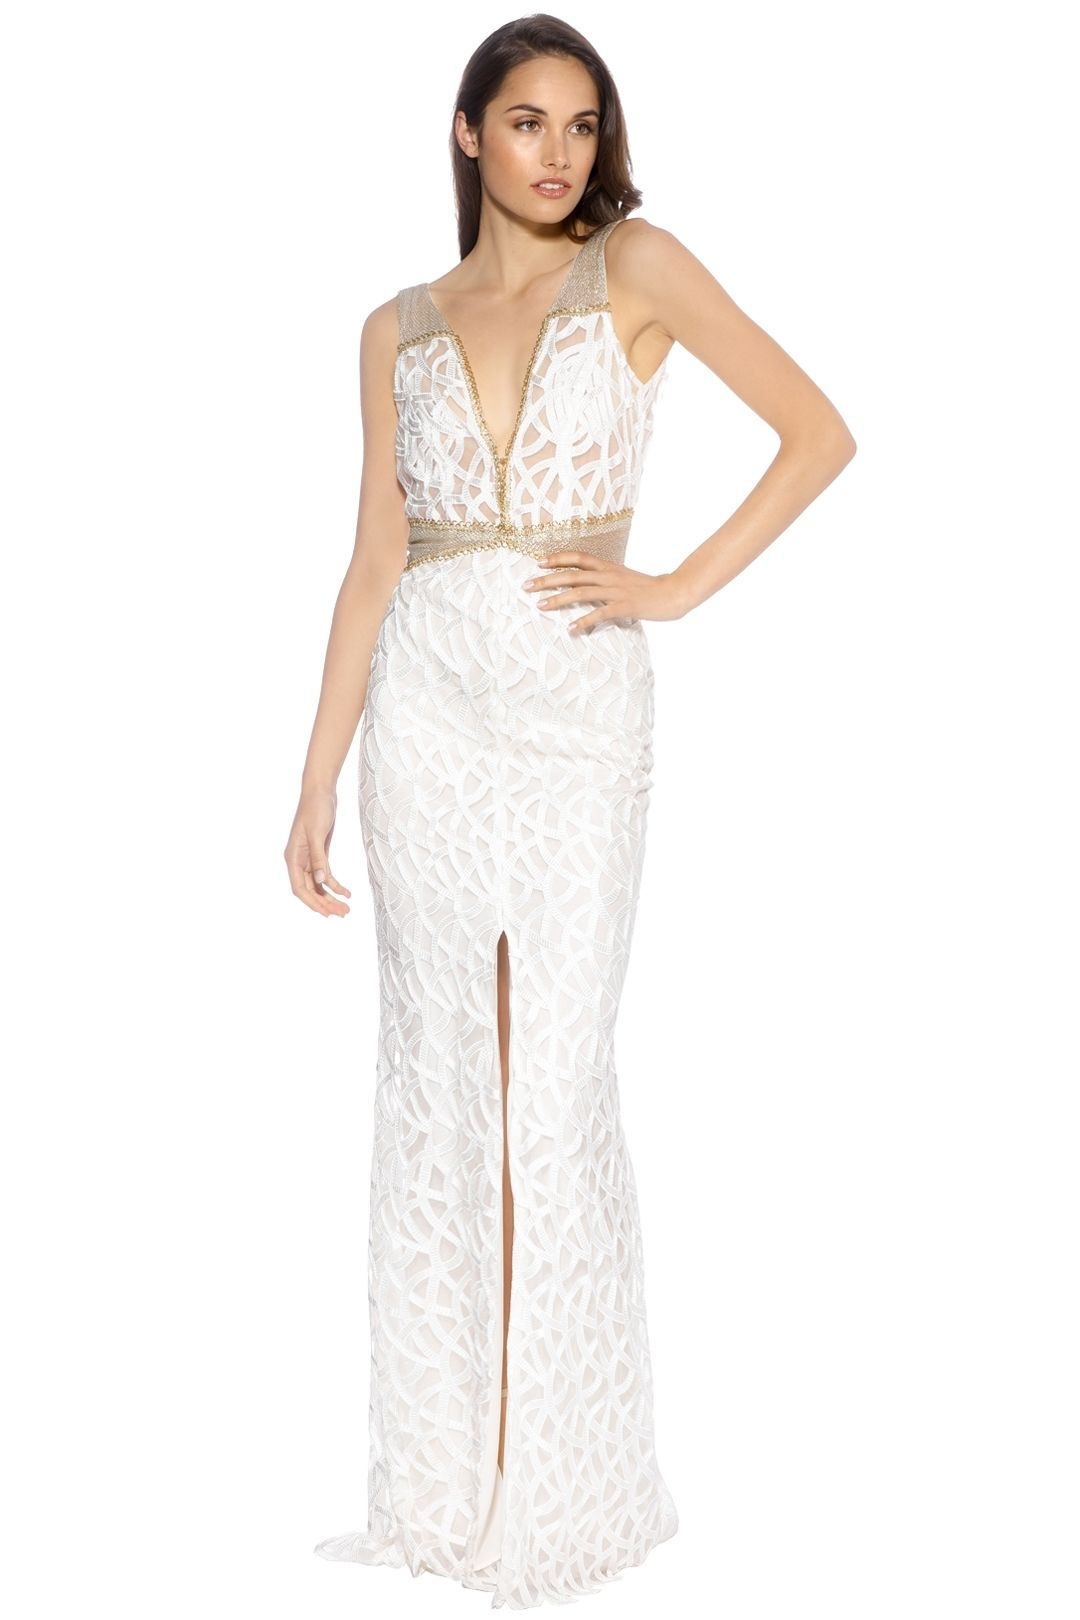 LUOM.O  - Ondine Dress - White - Front